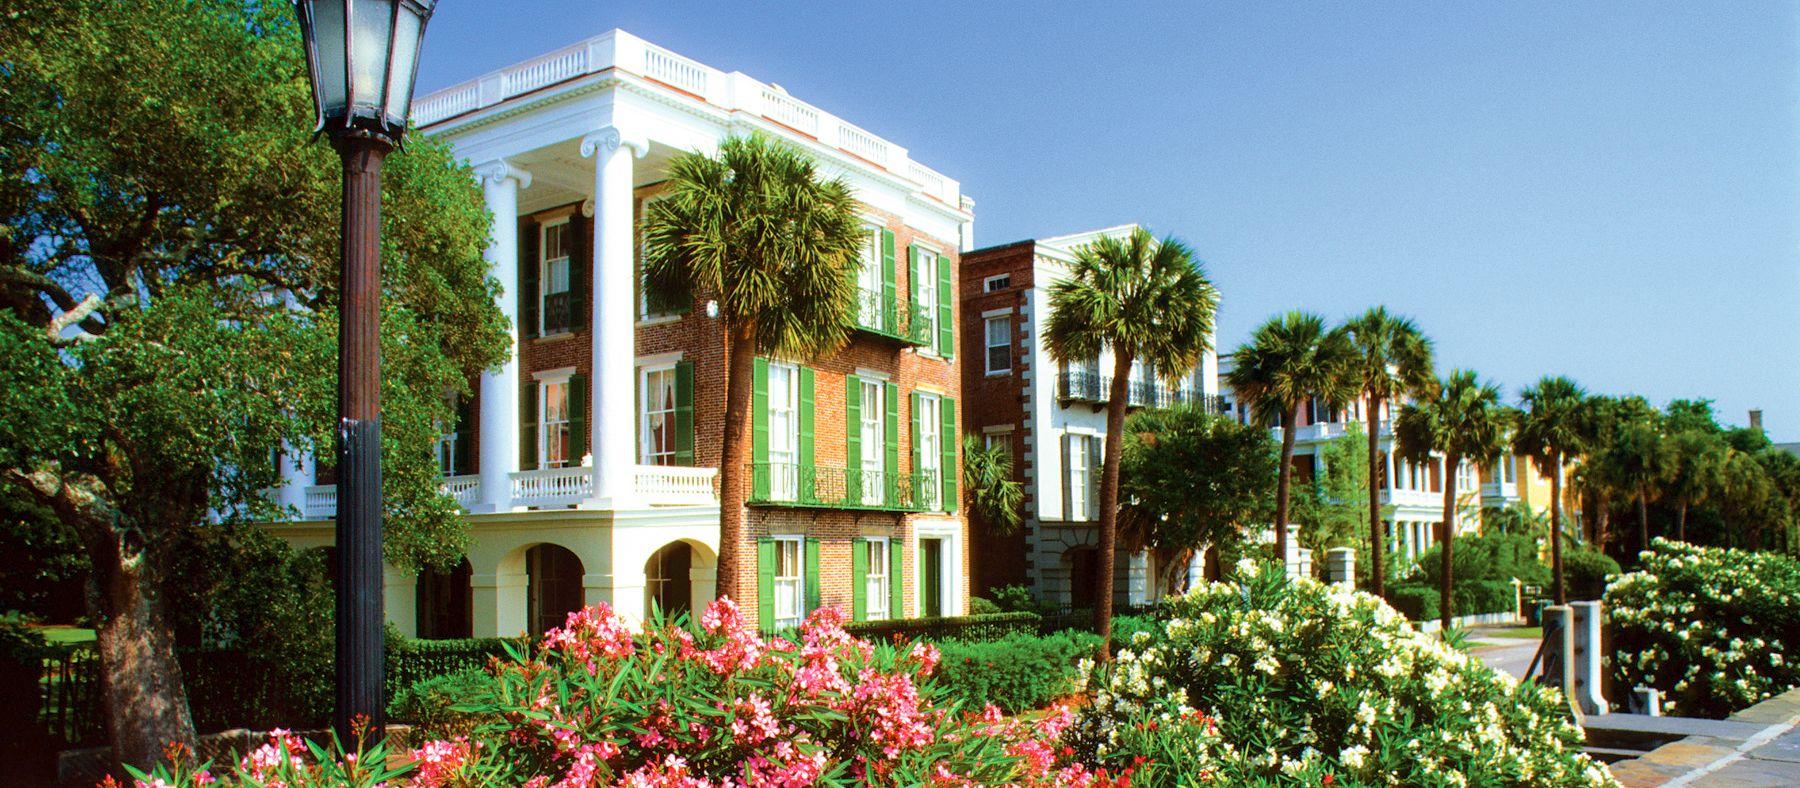 Eine Promenade in Charleston, South Carolina